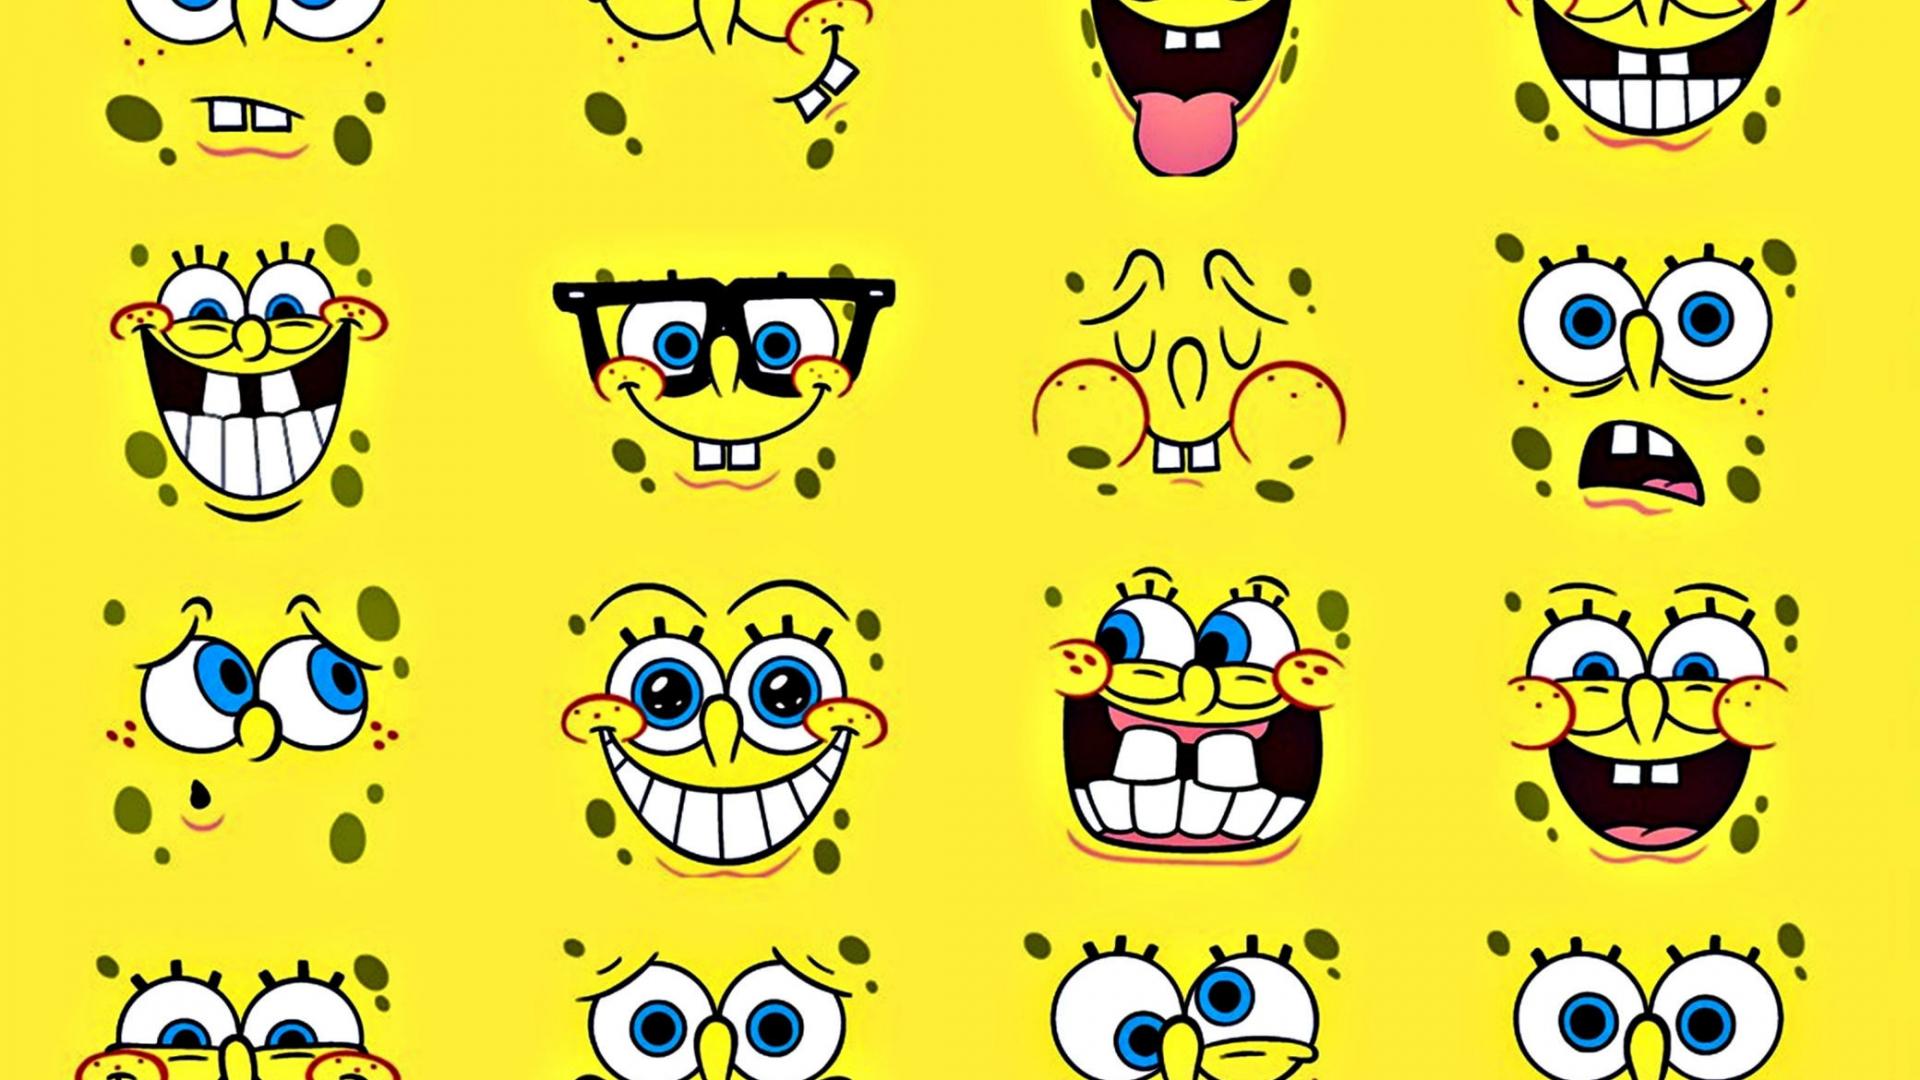 Free Download Spongebob Picture Wallpaper Hd E1382699113748 Face Spongebob 2080x1560 For Your Desktop Mobile Tablet Explore 50 Spongebob Wallpaper Hd Spongebob Squarepants Wallpaper Live Spongebob Wallpapers Spongebob Screensavers And Wallpaper